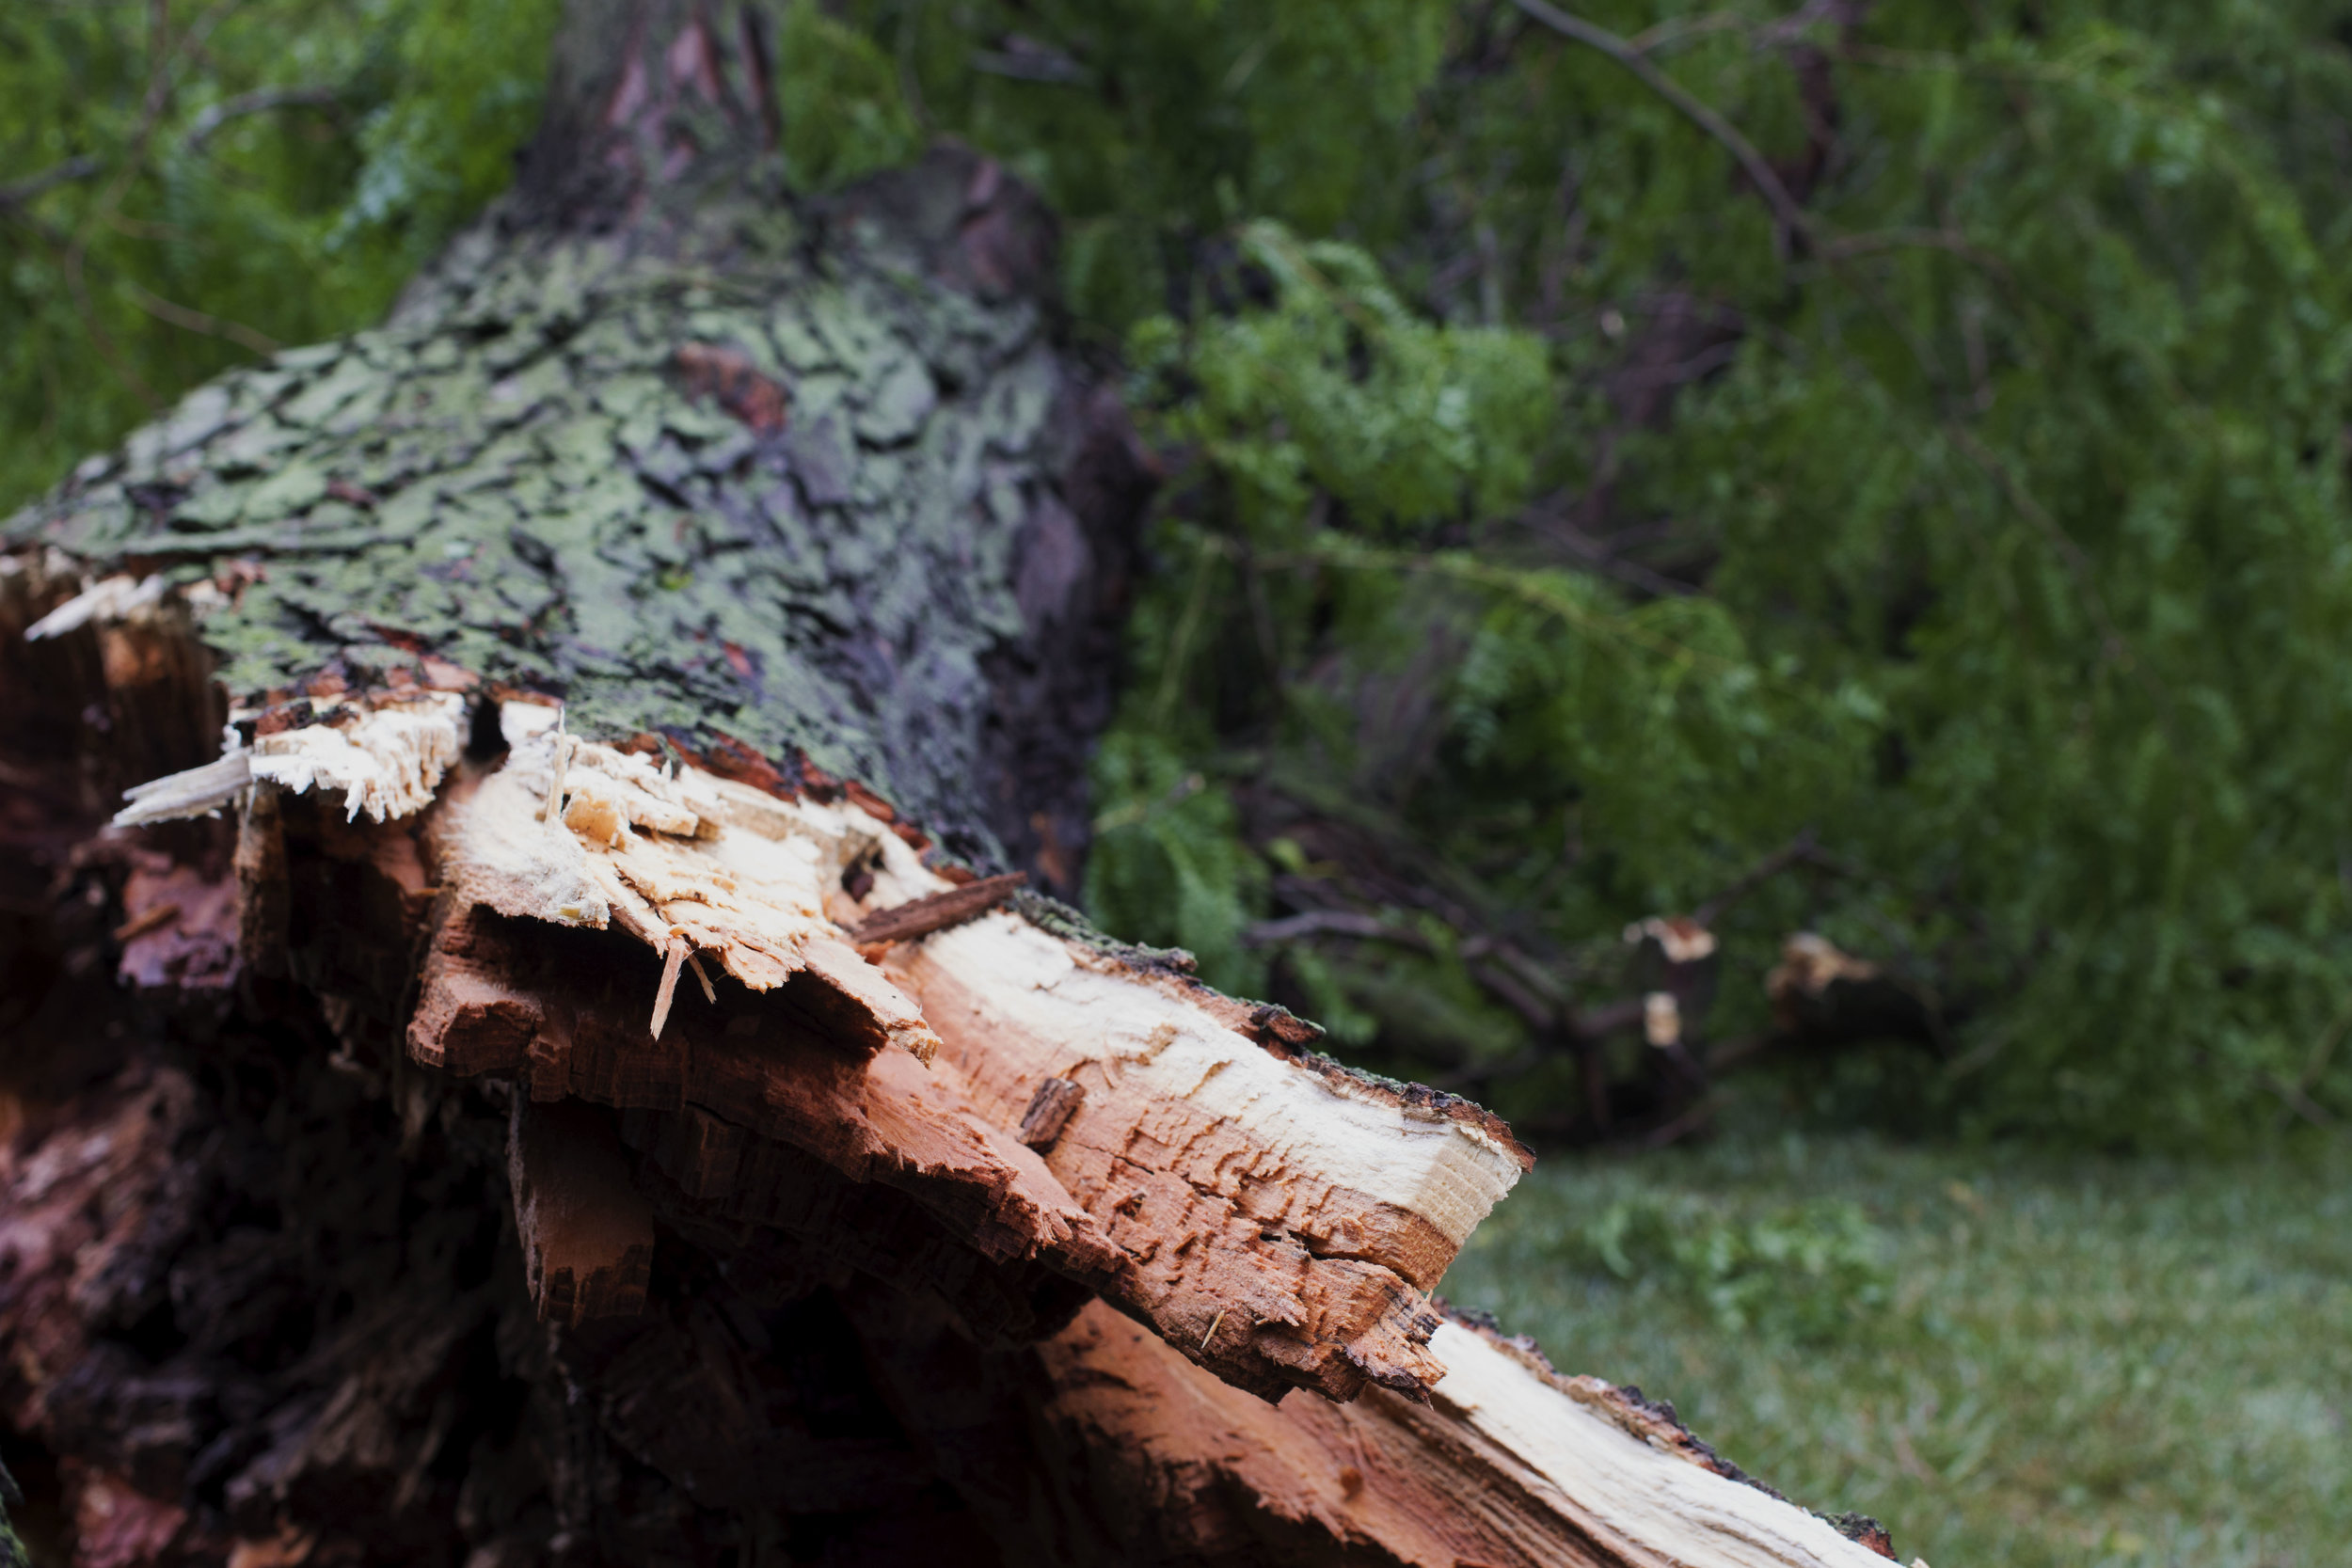 Severe storm splintered trees across campus. PC: Kayla Potts